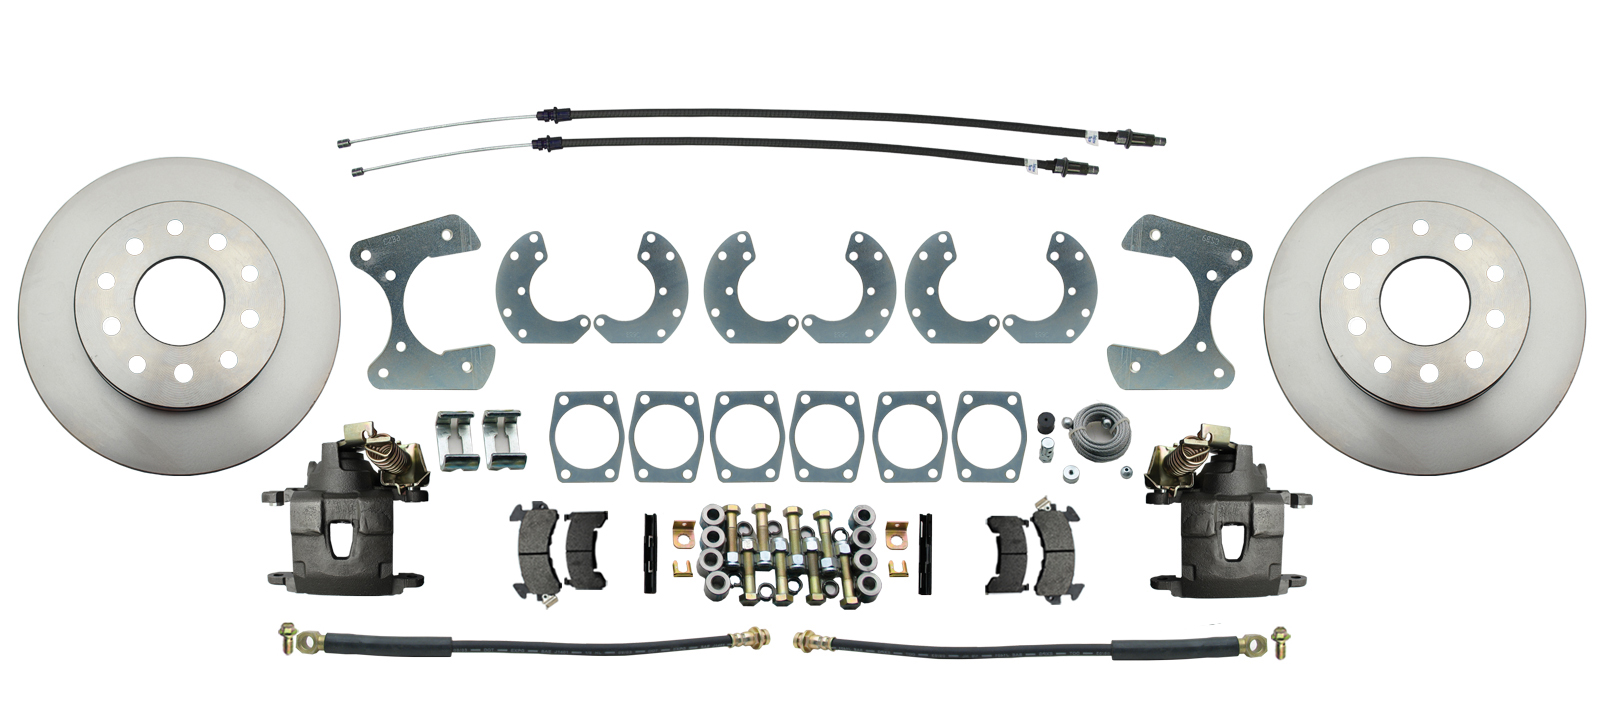 Universal Ford 8.8 & 9 Rear-End Universal Disc Brake Kit